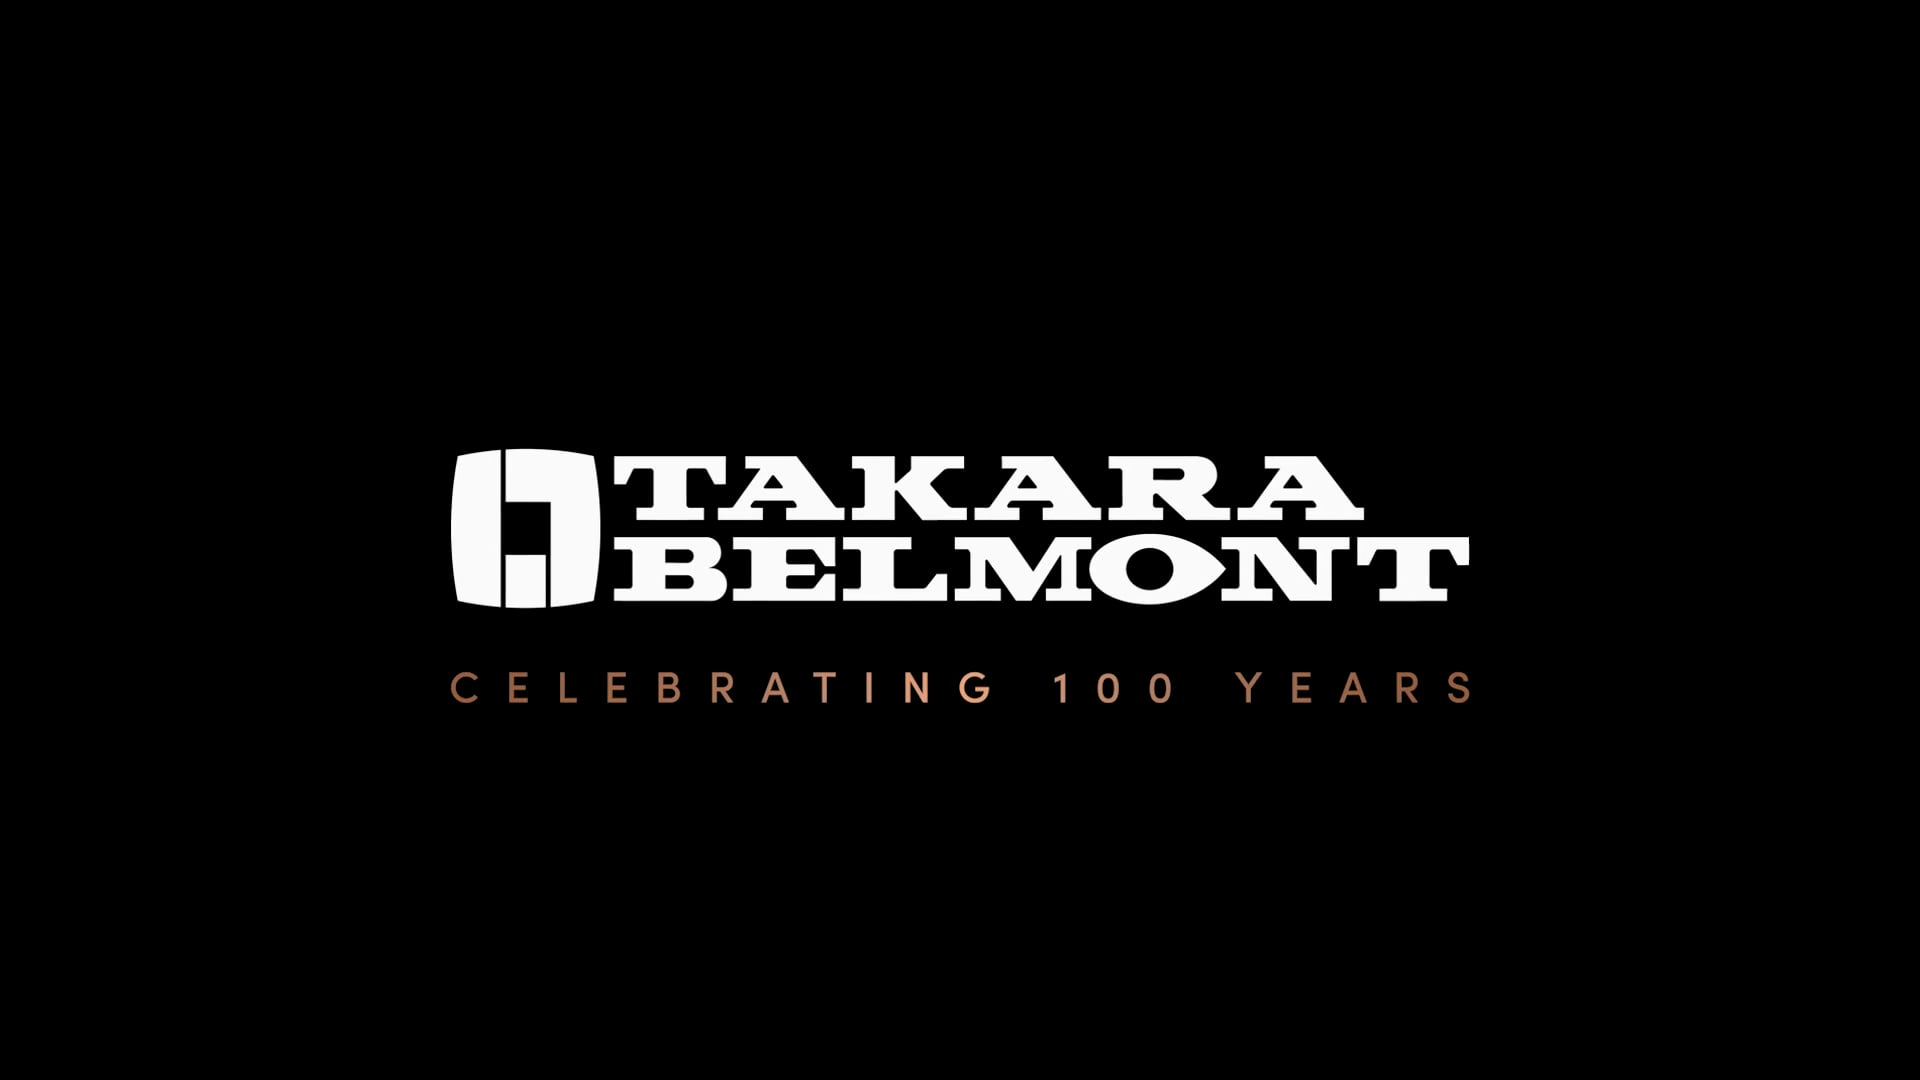 Takara Belmont Salon International